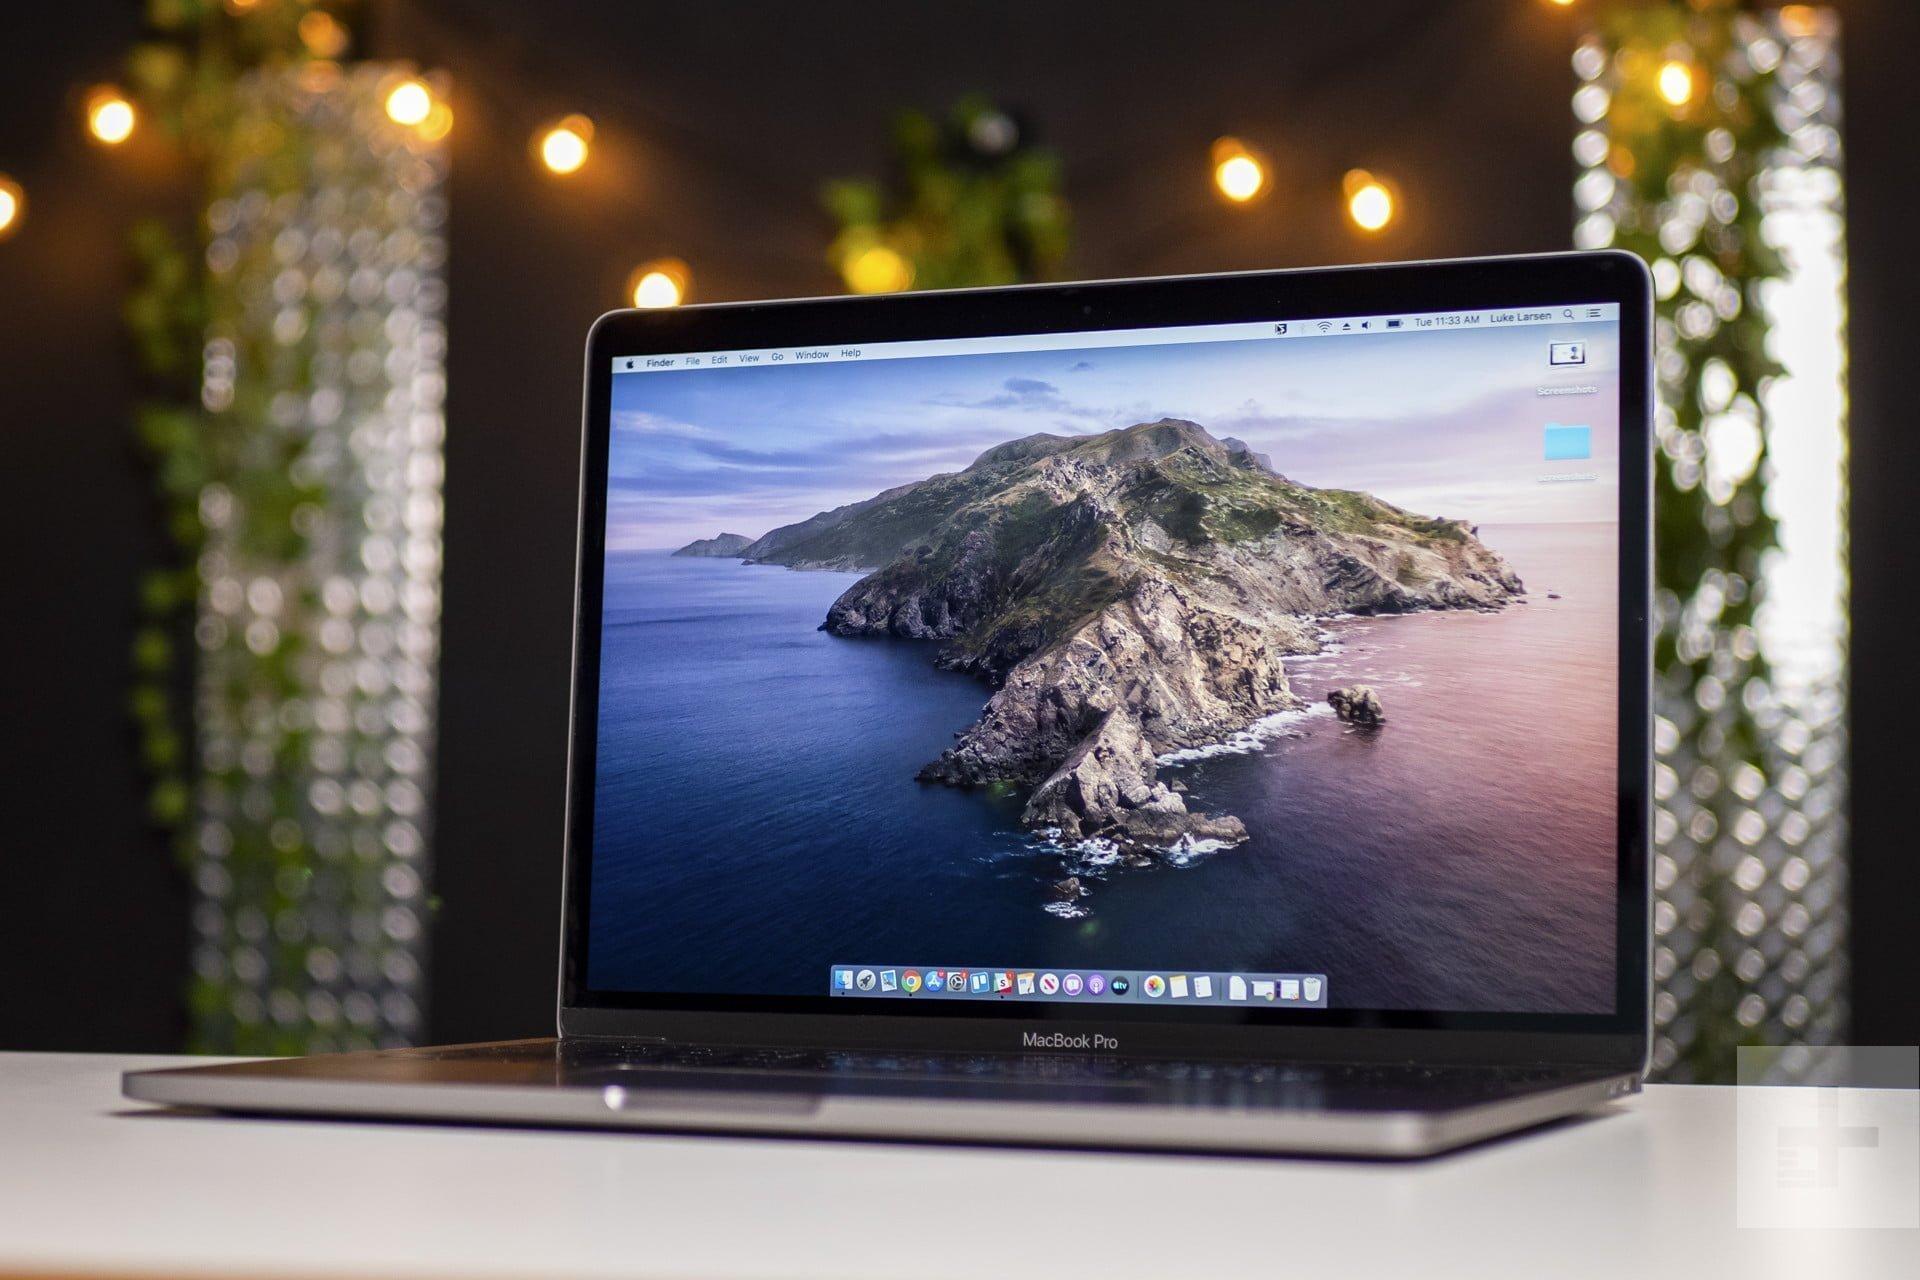 Black Friday Sale - Apple MacBook Pro Coffee Lake i5